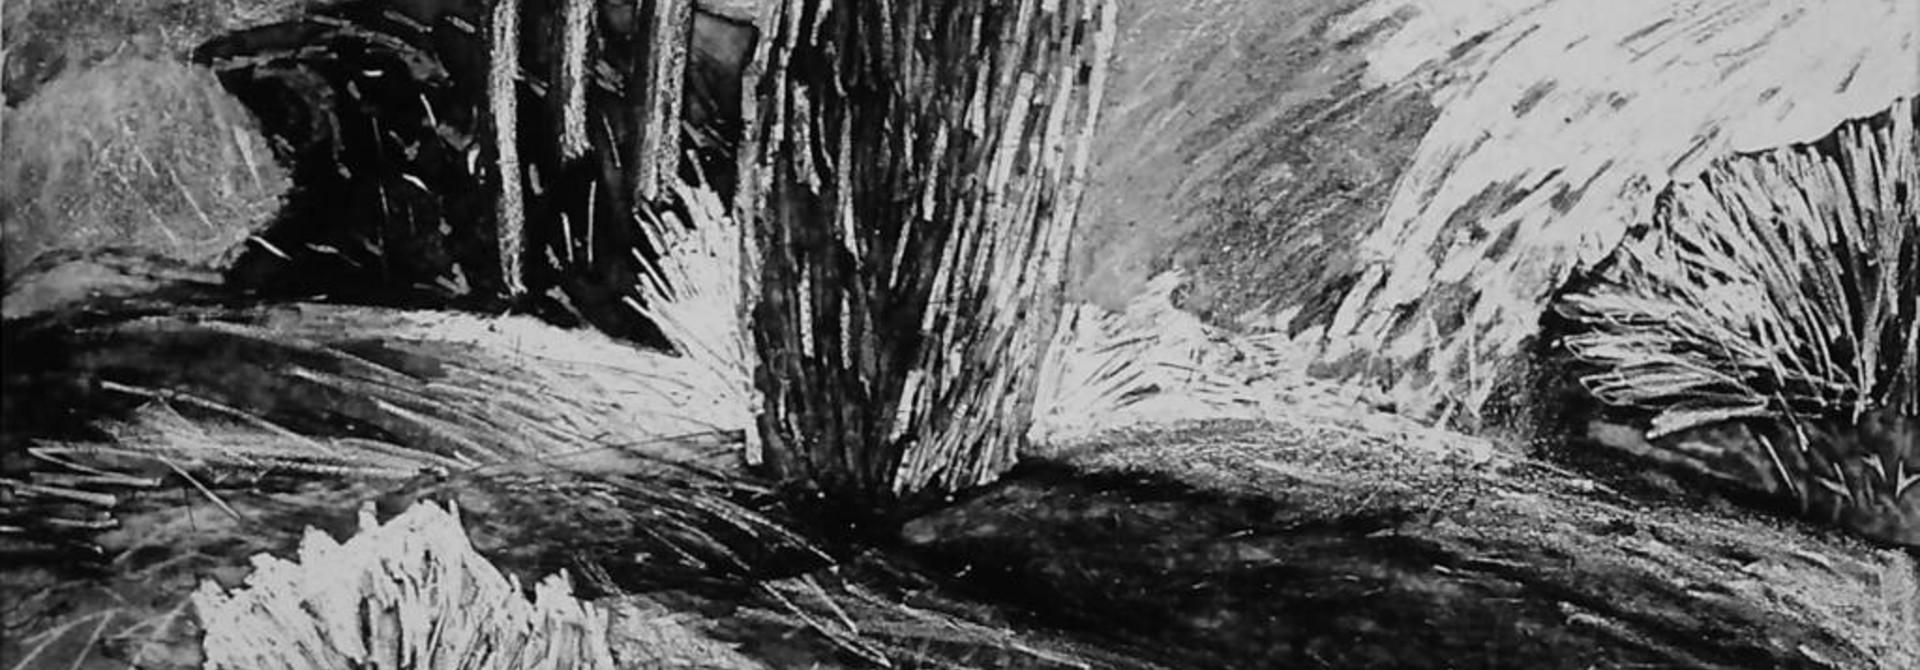 Mountain, Tree, Wave